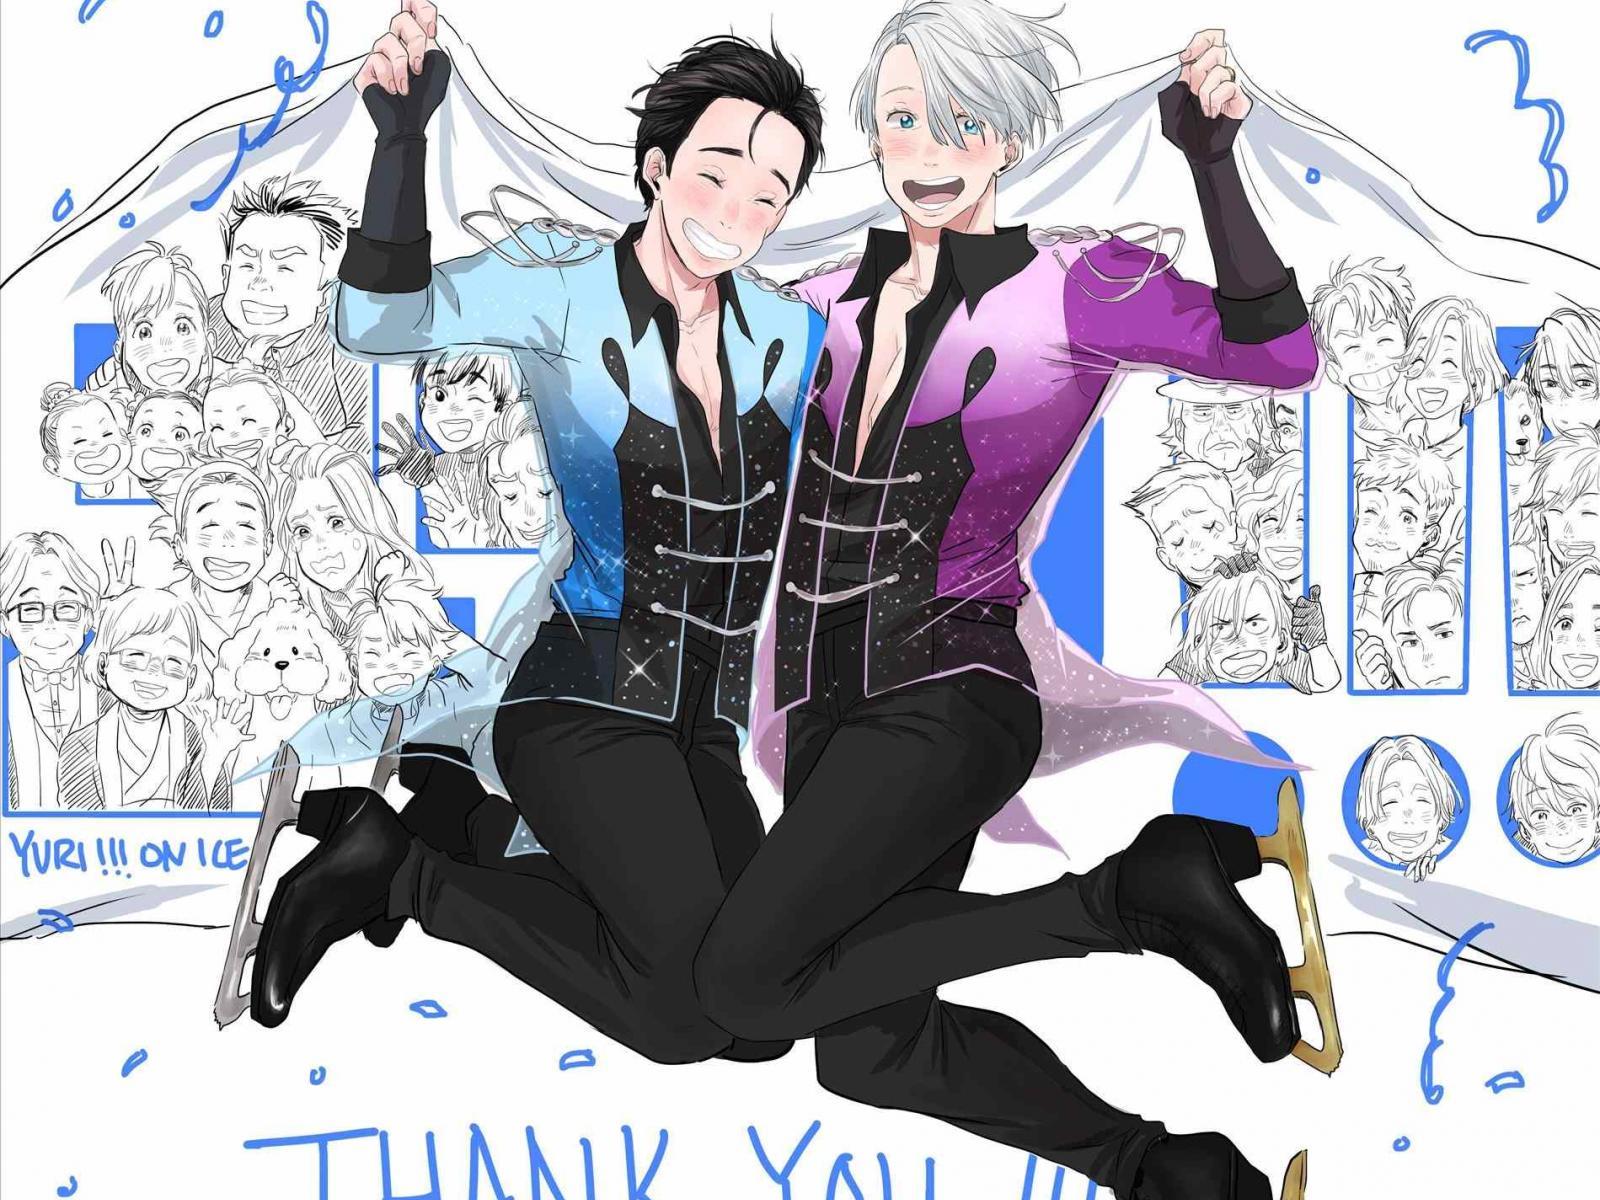 De Yuri On Ice 2069219 Hd Wallpaper Backgrounds Download